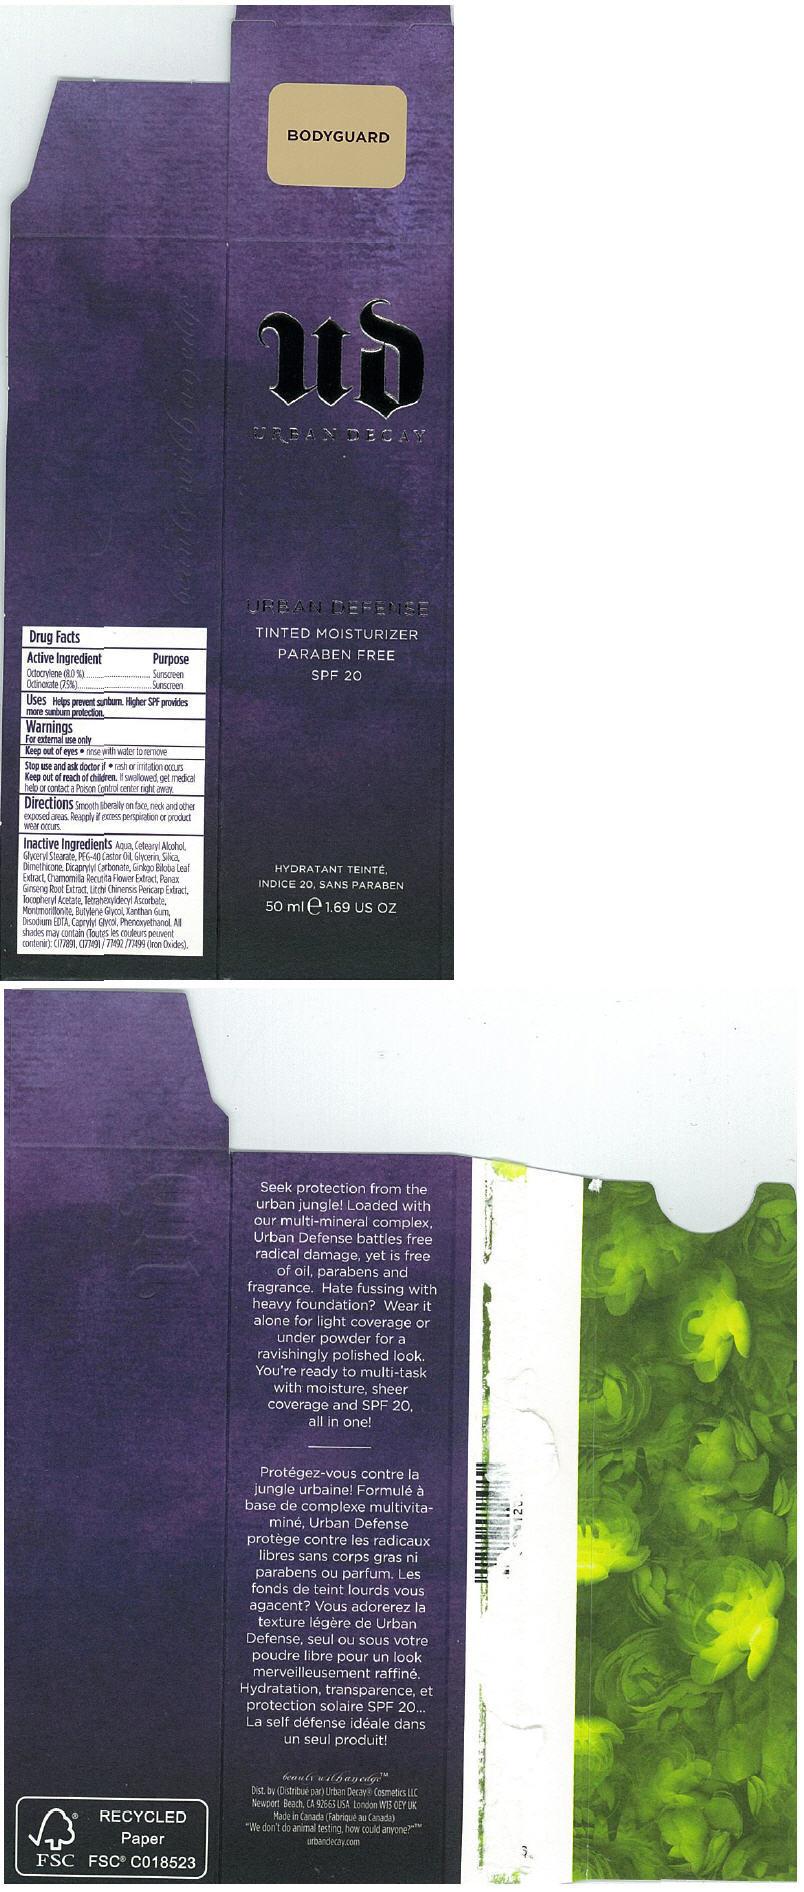 Principal Display Panel - 50 ml BODYGUARD Carton